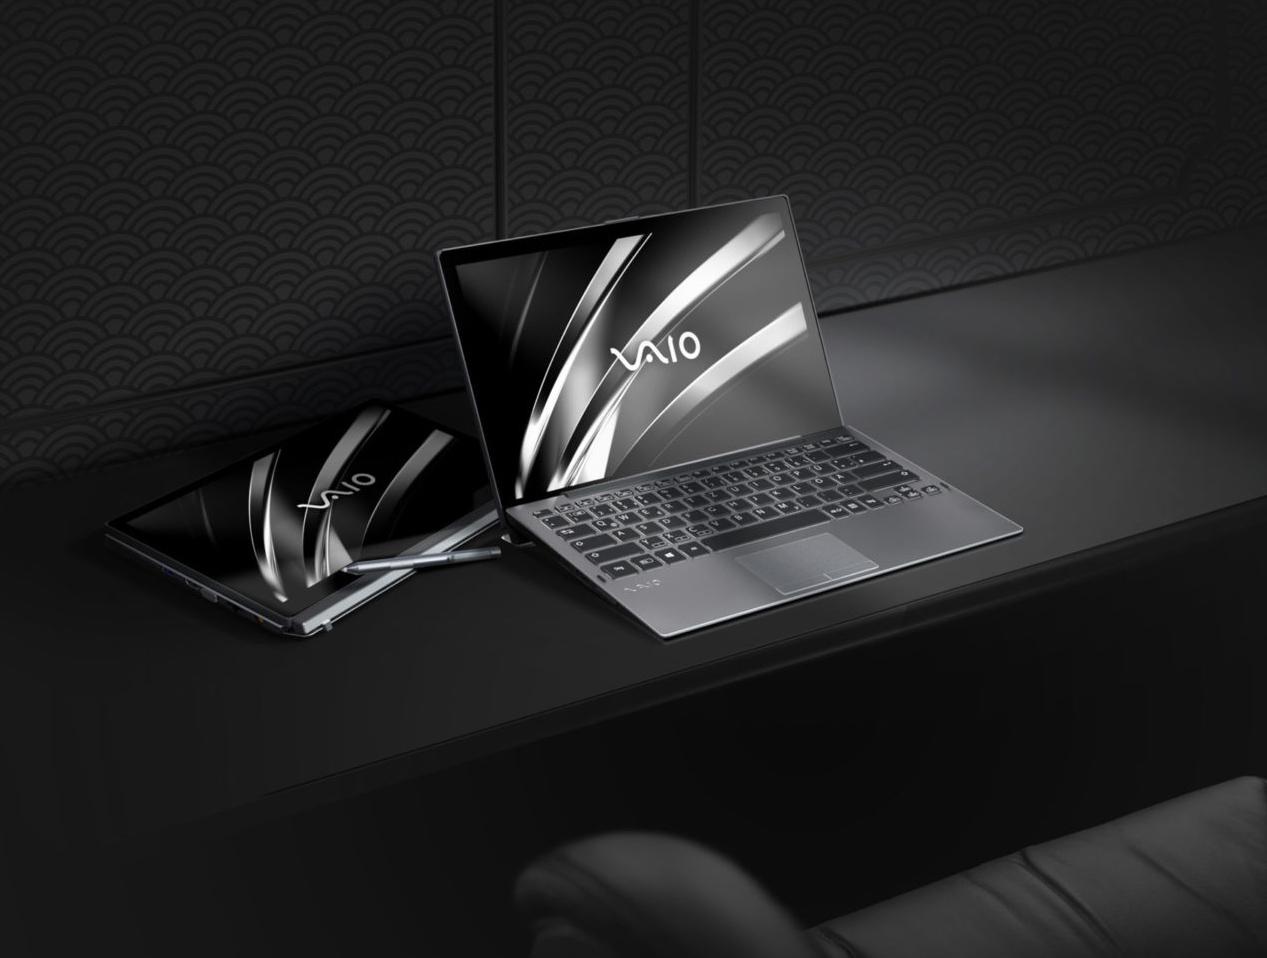 Sony Vaio Laptop Teaser | Dark